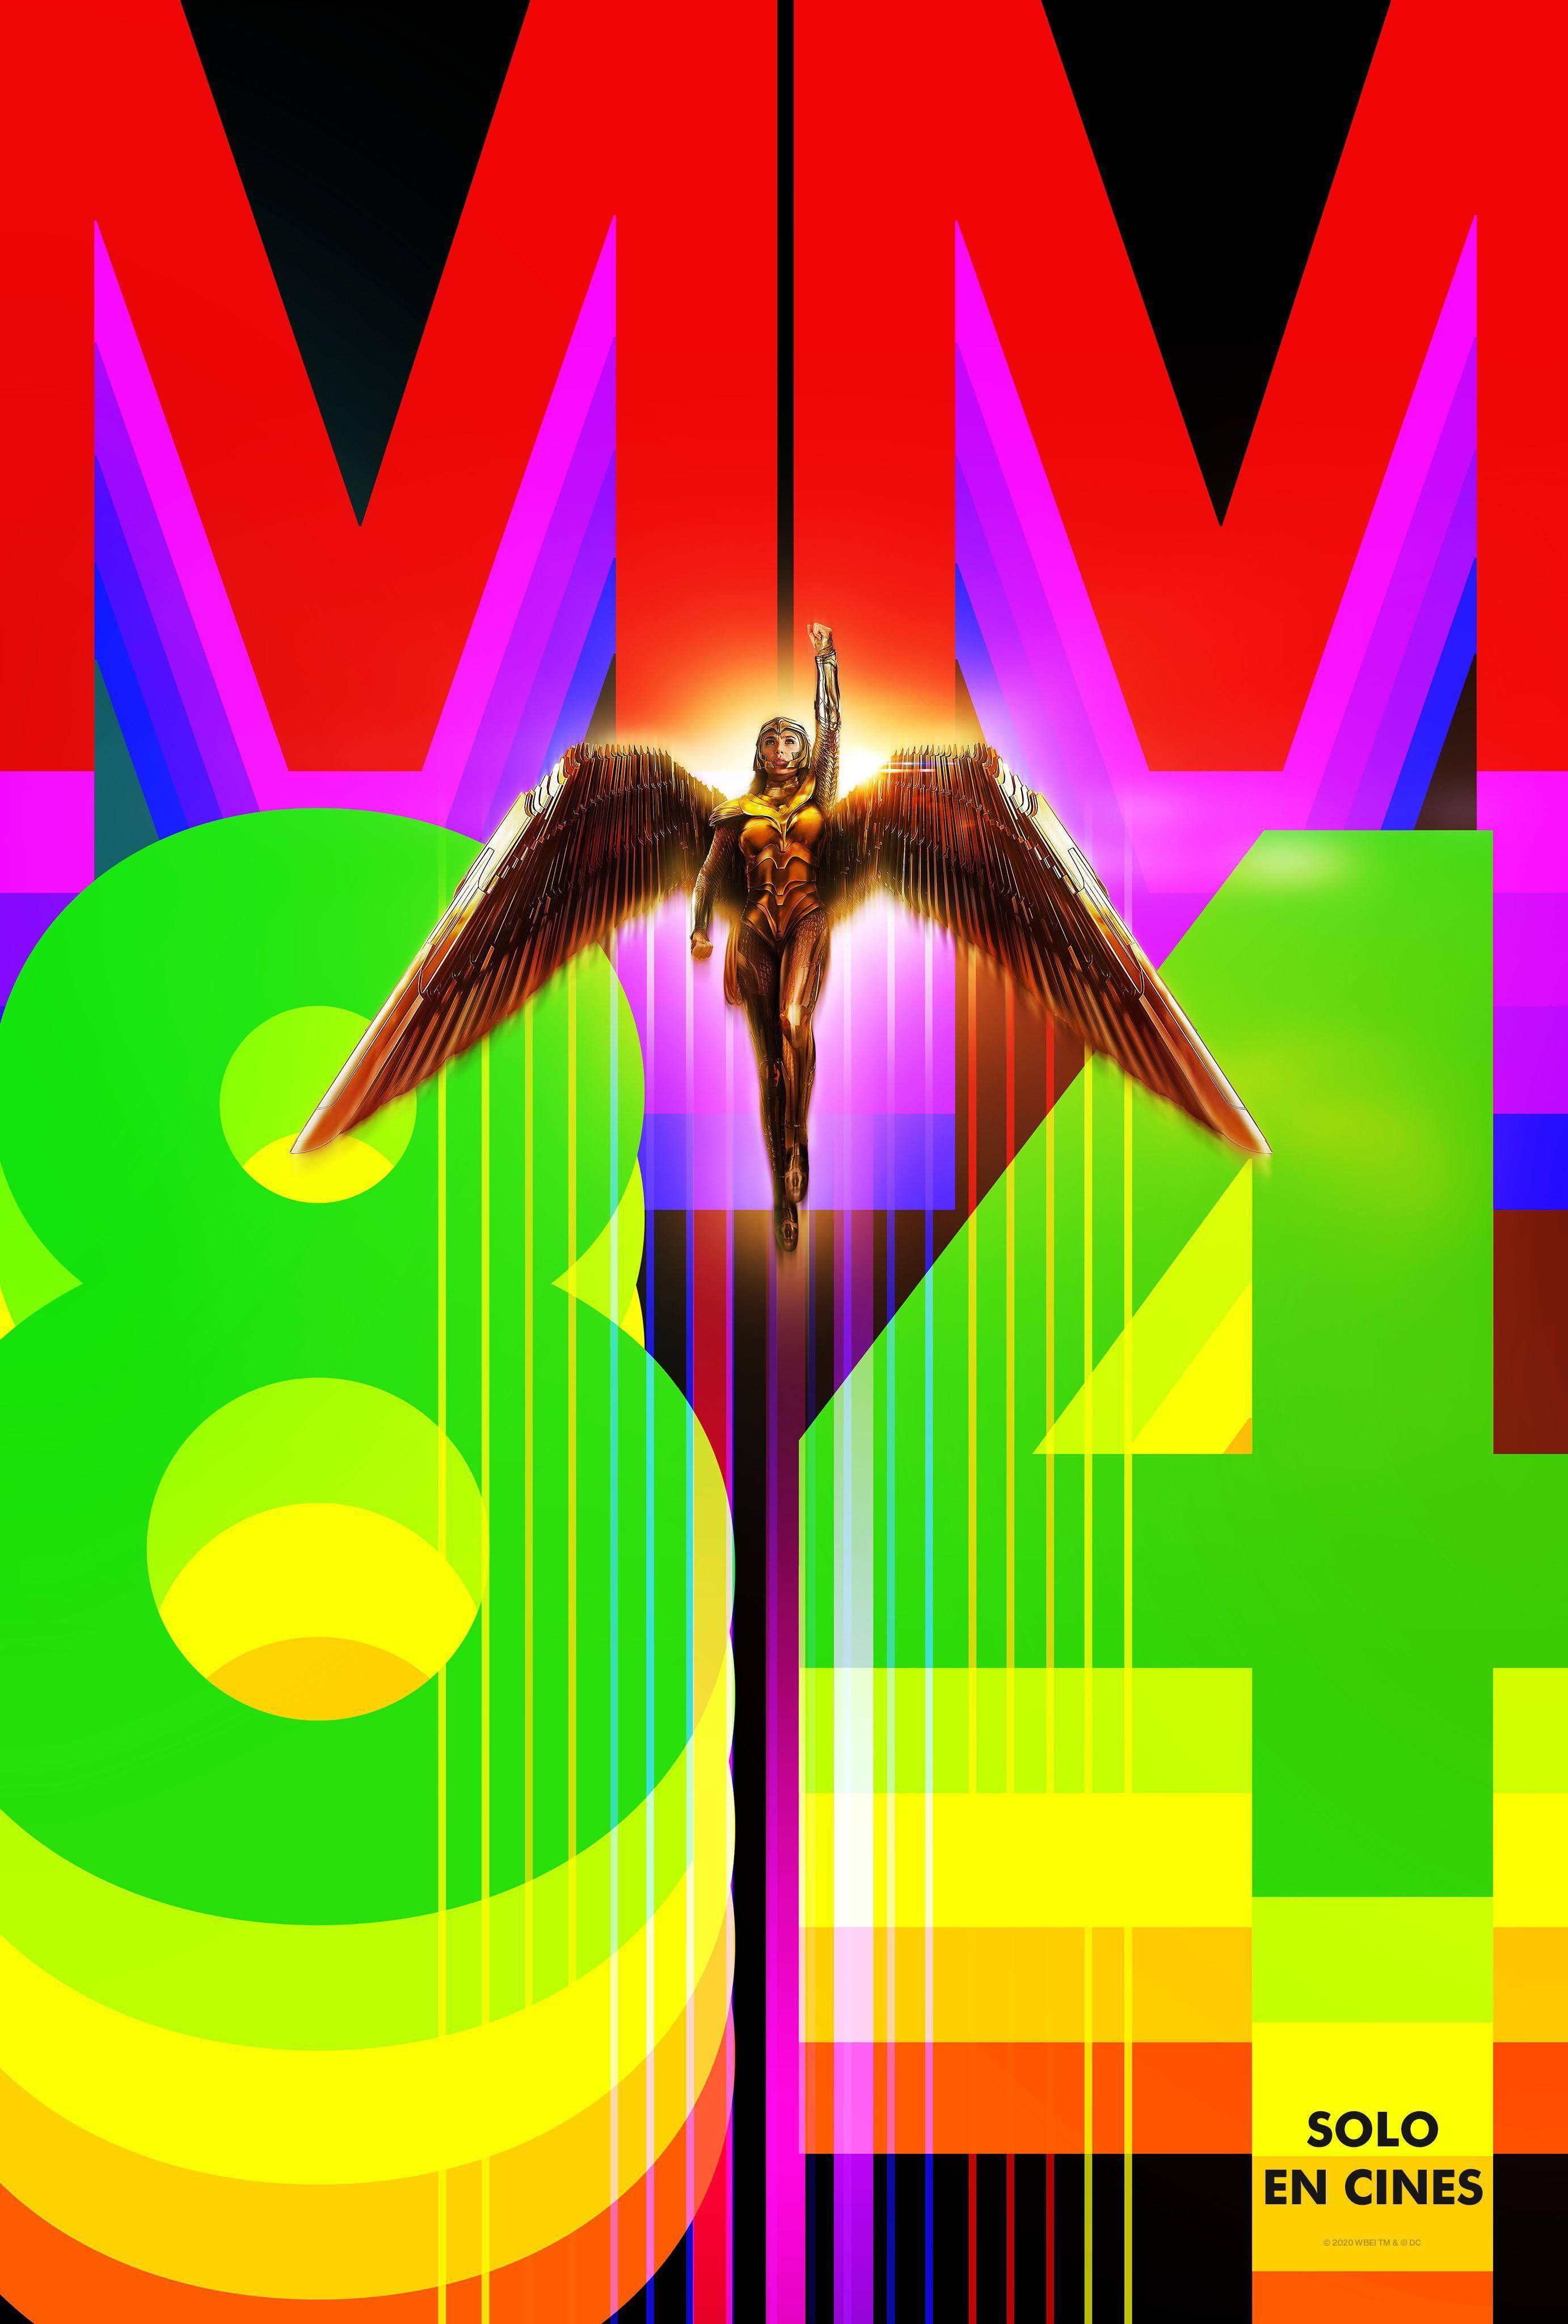 2020 Wonder Woman 1984 Tt7126948 Wonder Woman Ver Peliculas Online Cine Fantastico